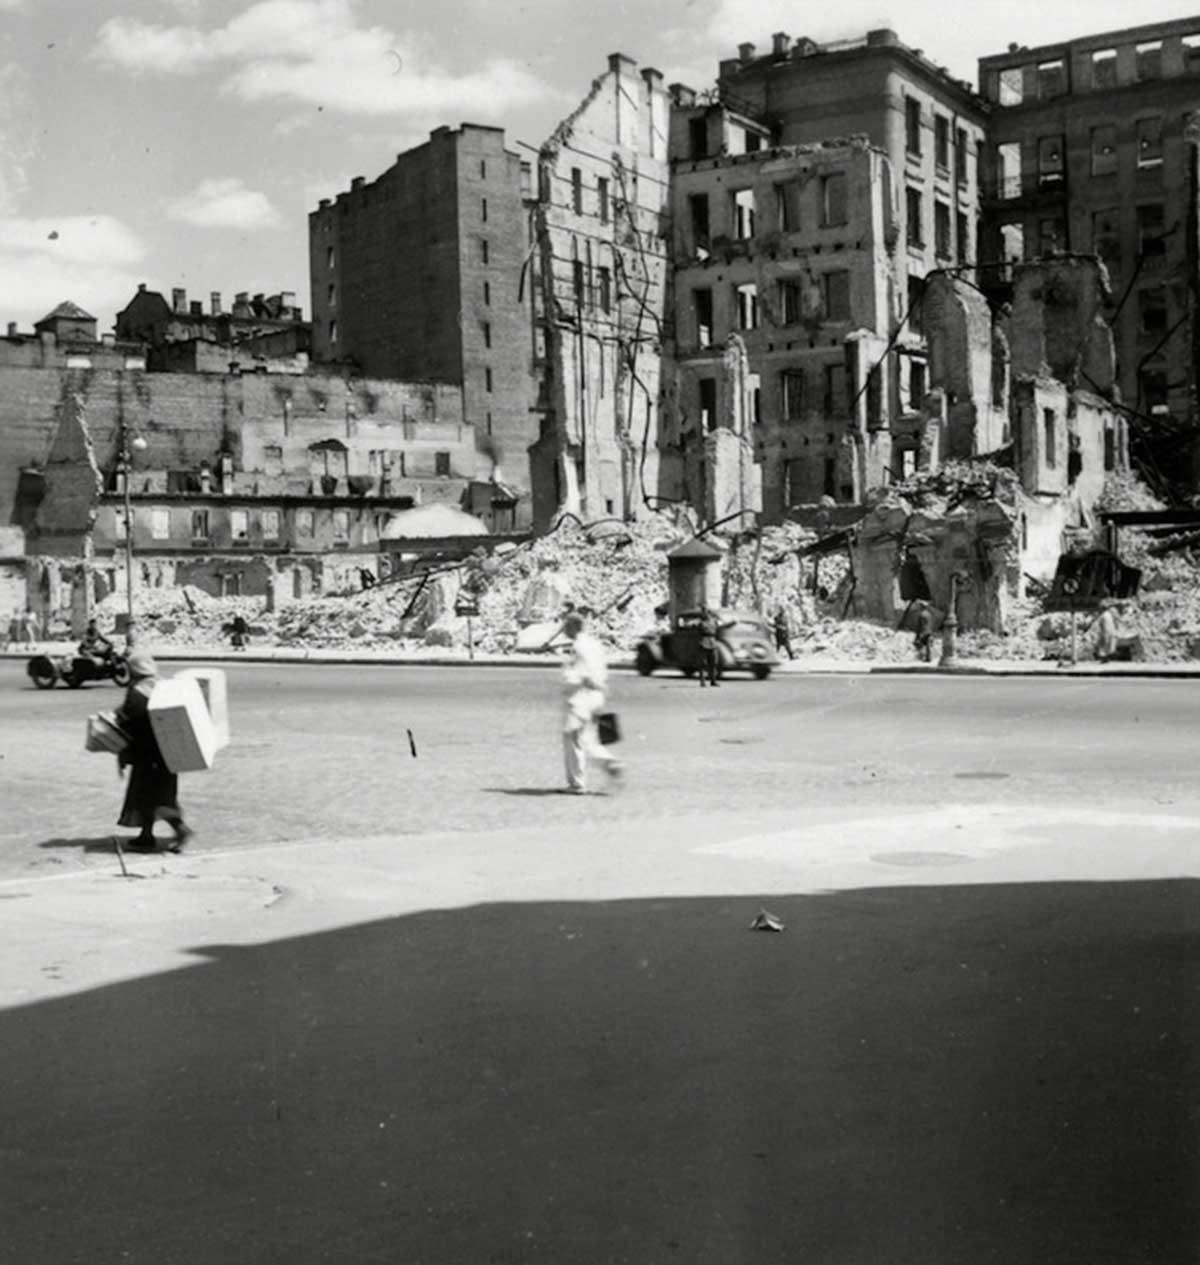 Edificios en ruinas. Ucrania, 1943.